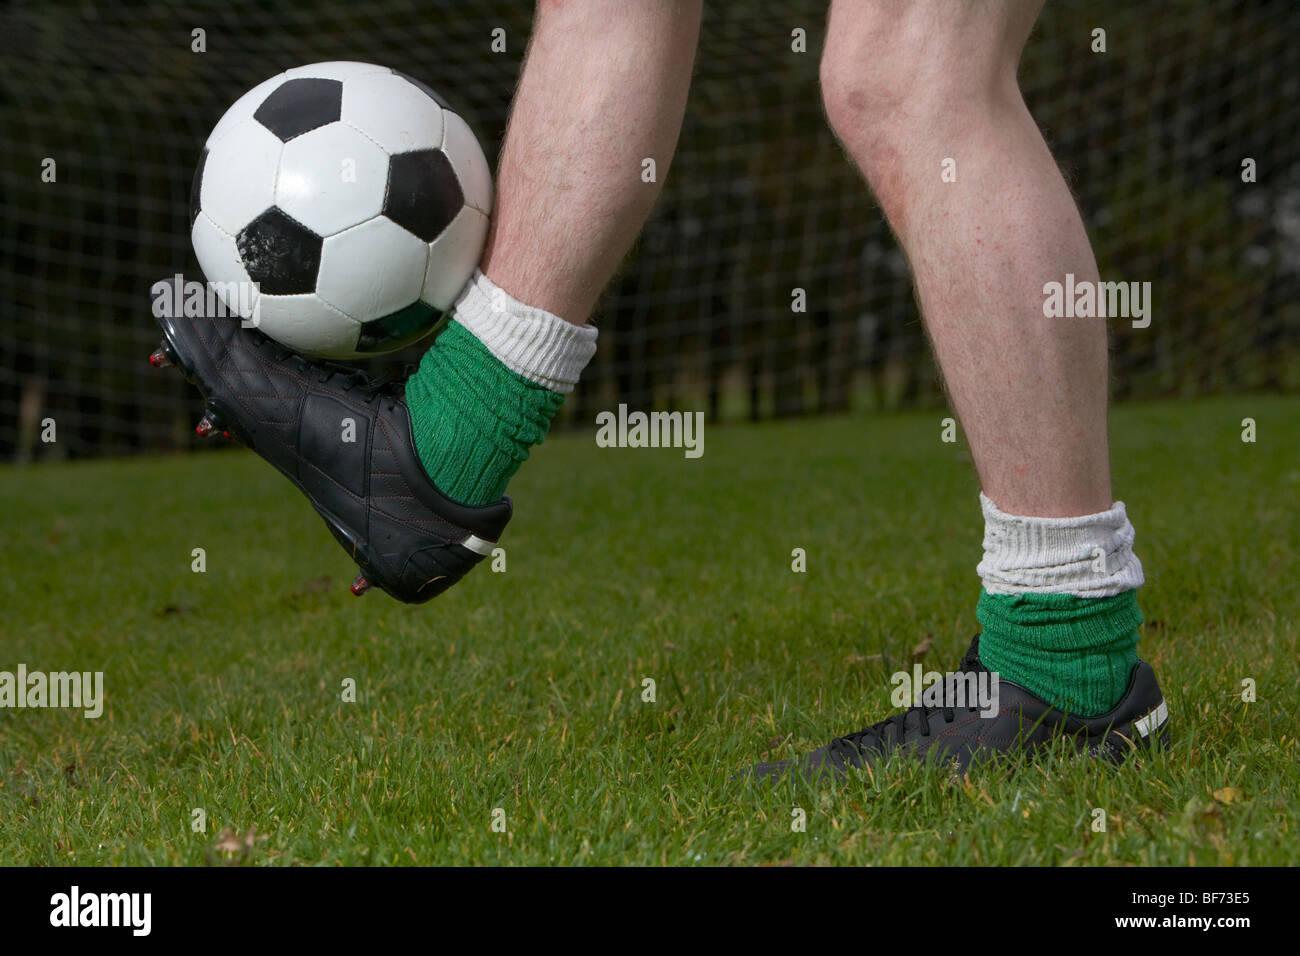 soccer football player balancing ball on one foot - Stock Image